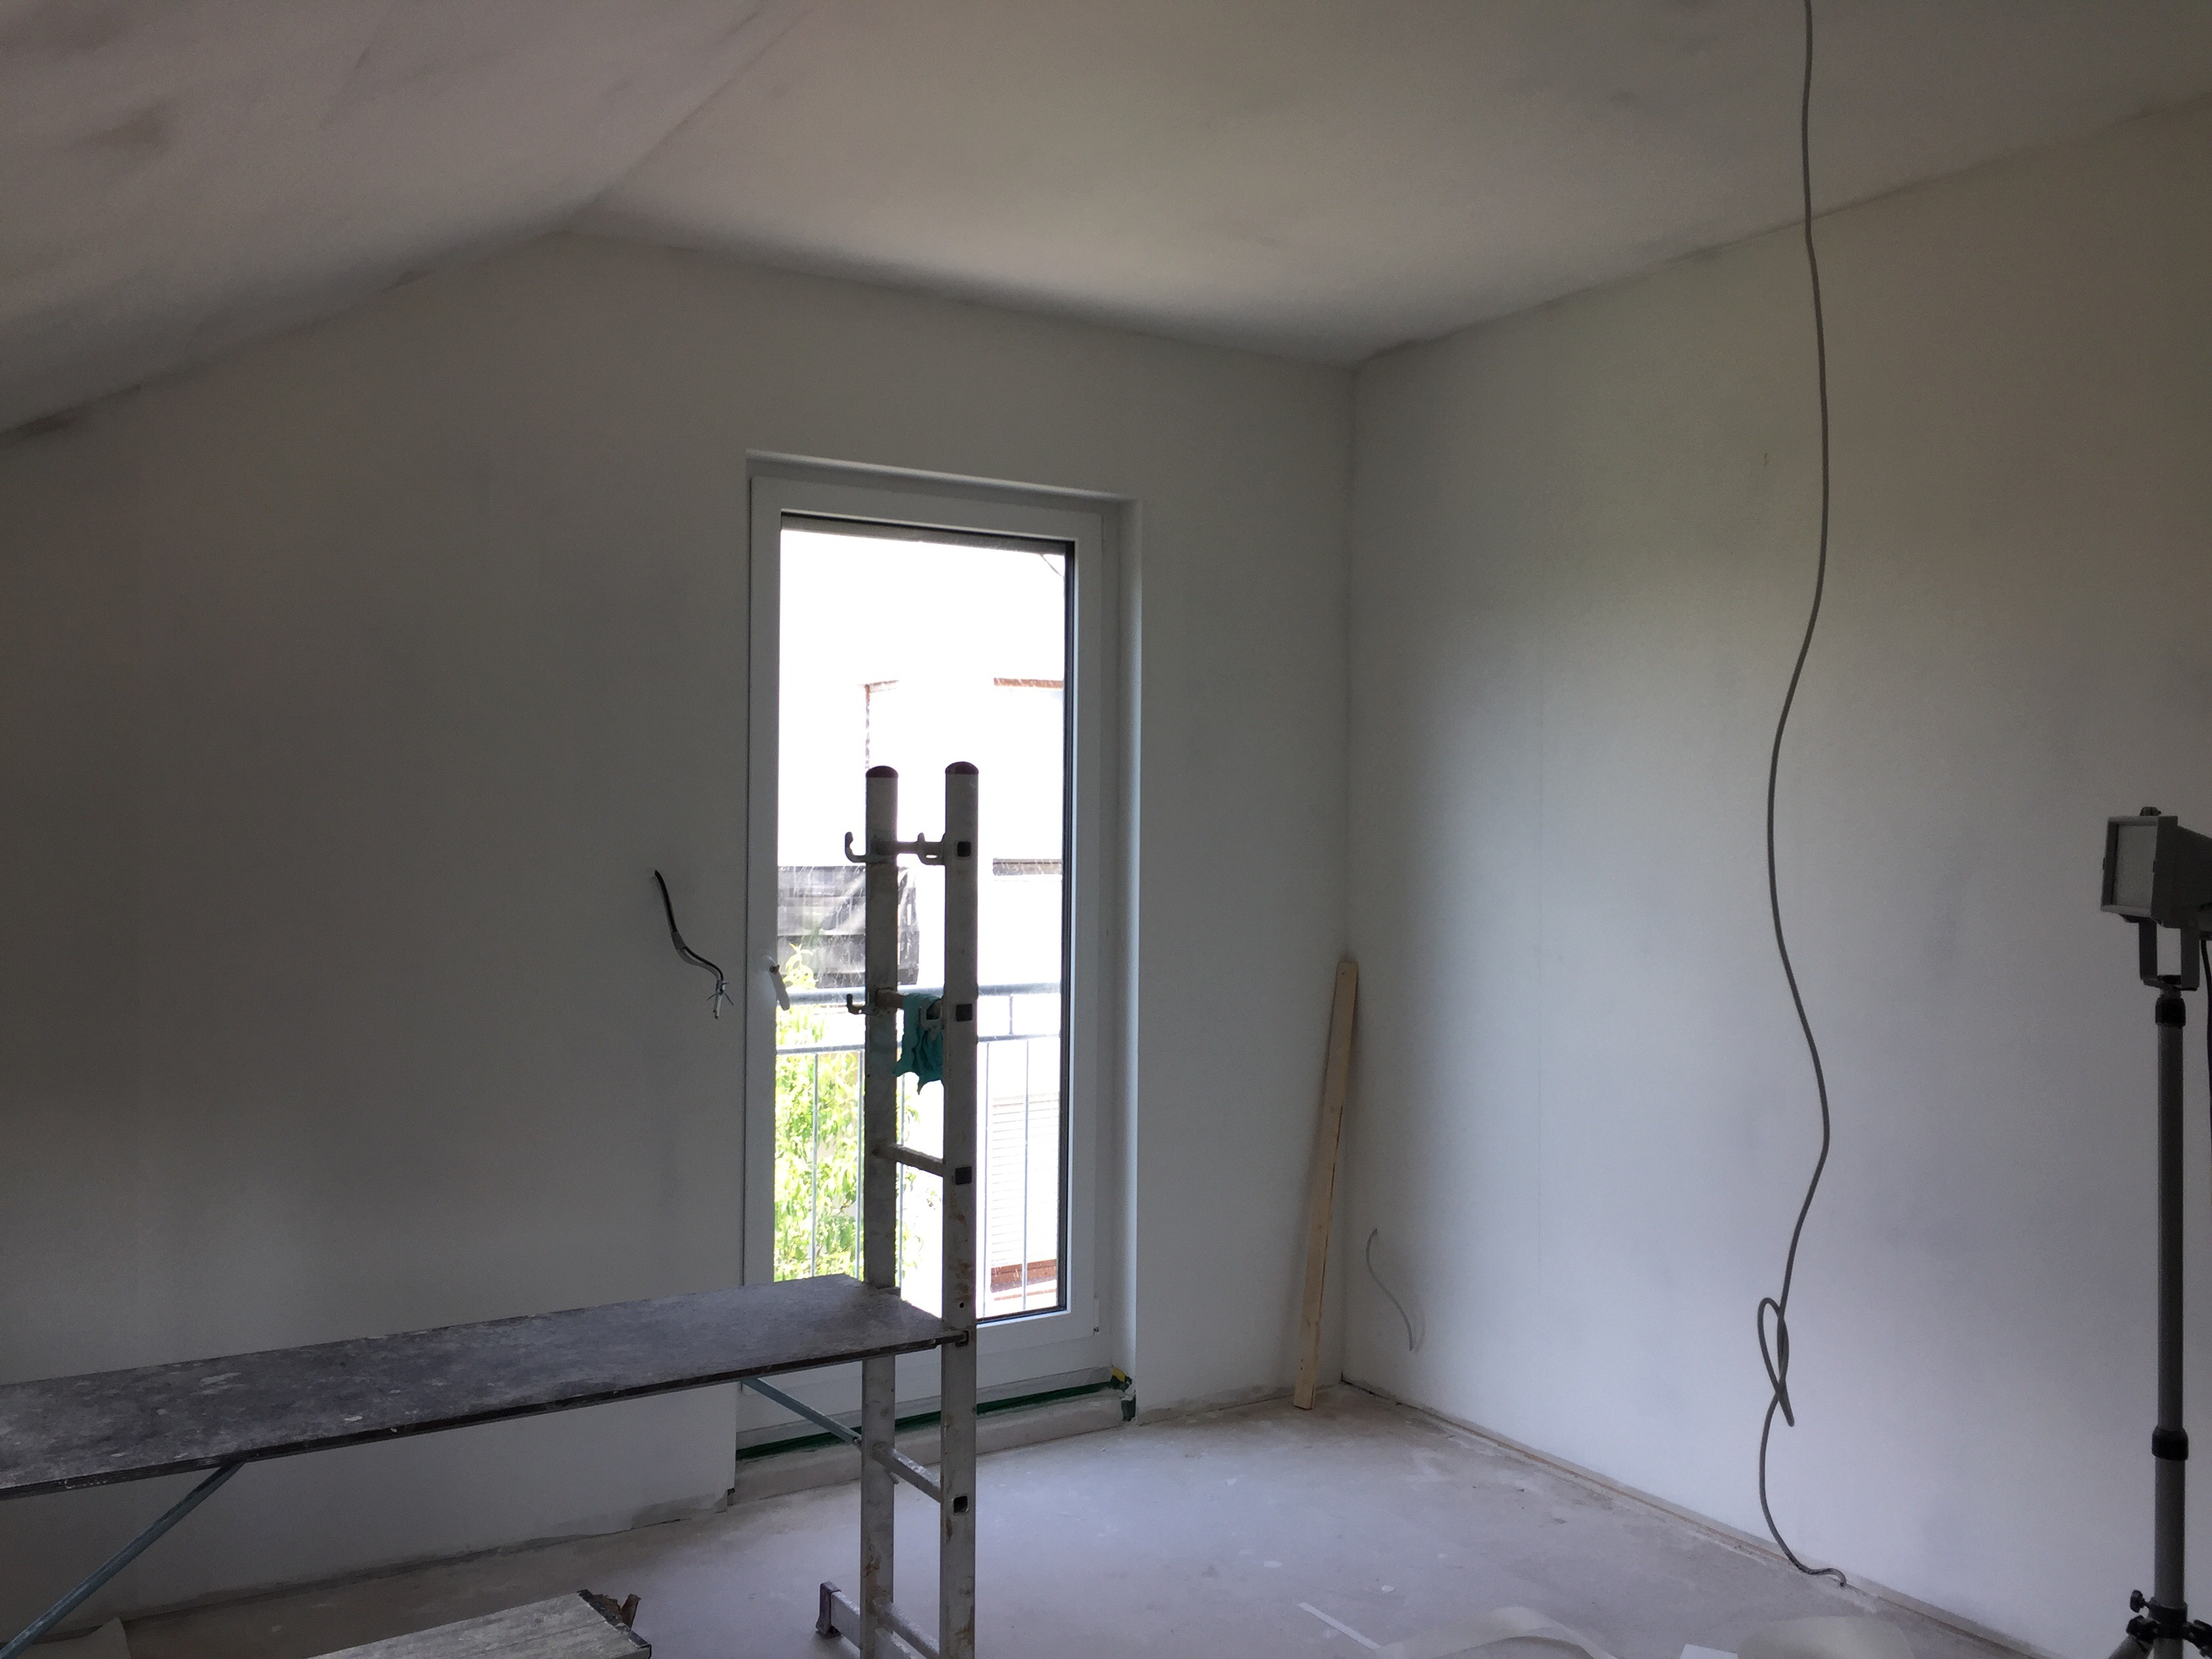 Hausbau Lichtplanung Modell : Syunpuu tapete beige gestreift fur hausbau lichtplanung